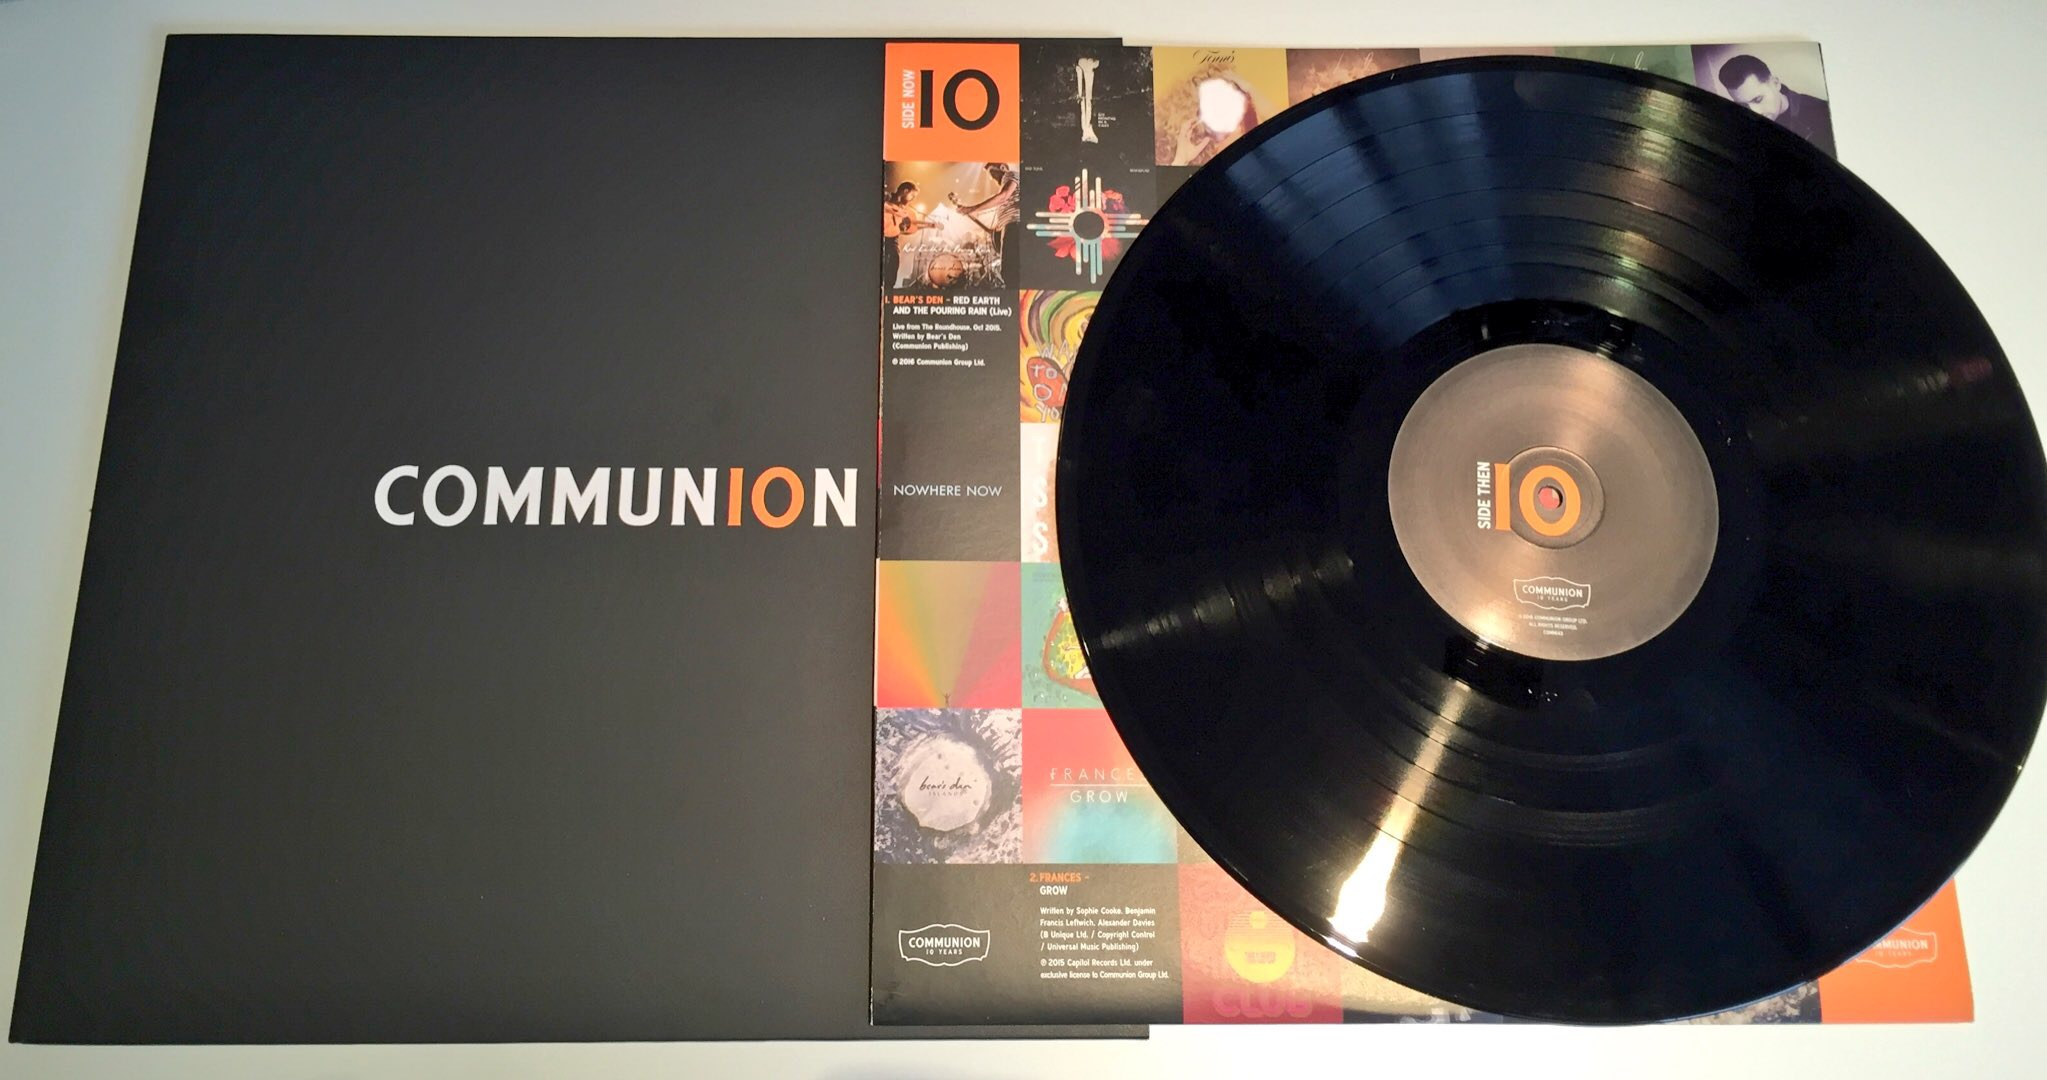 Communion 10